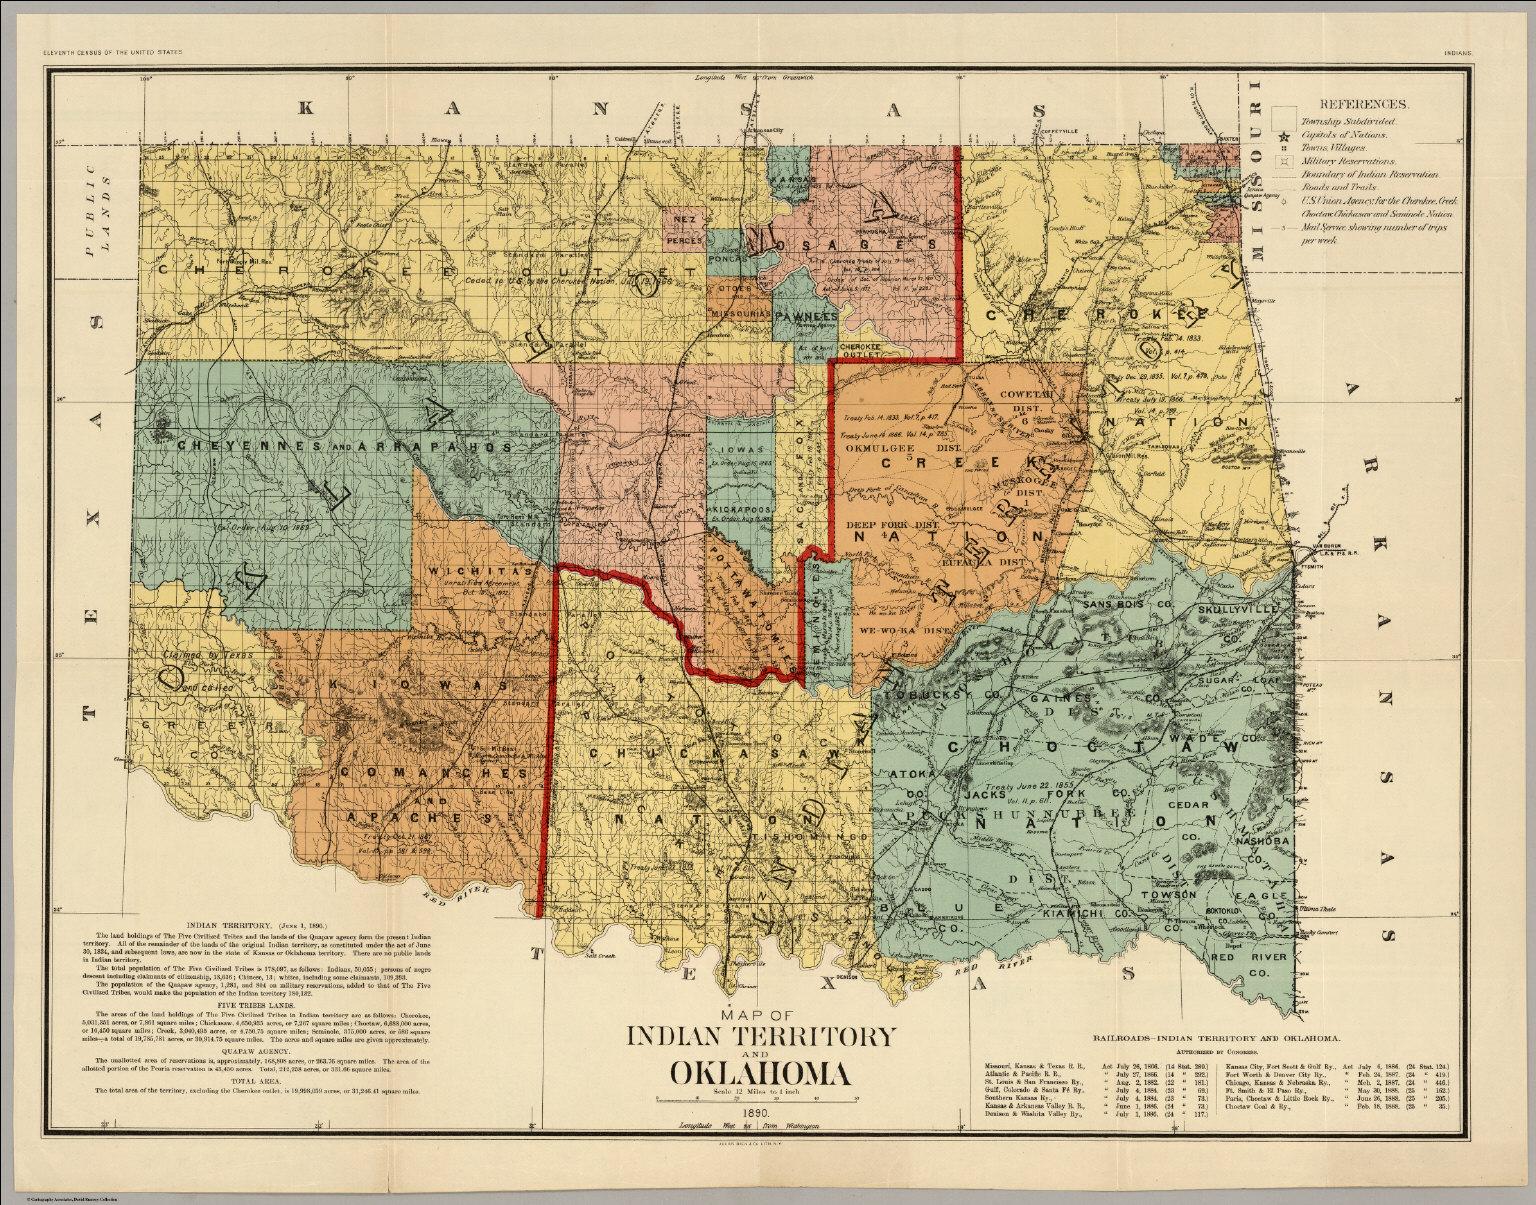 oklahoma-indian-territory1890-23.jpg